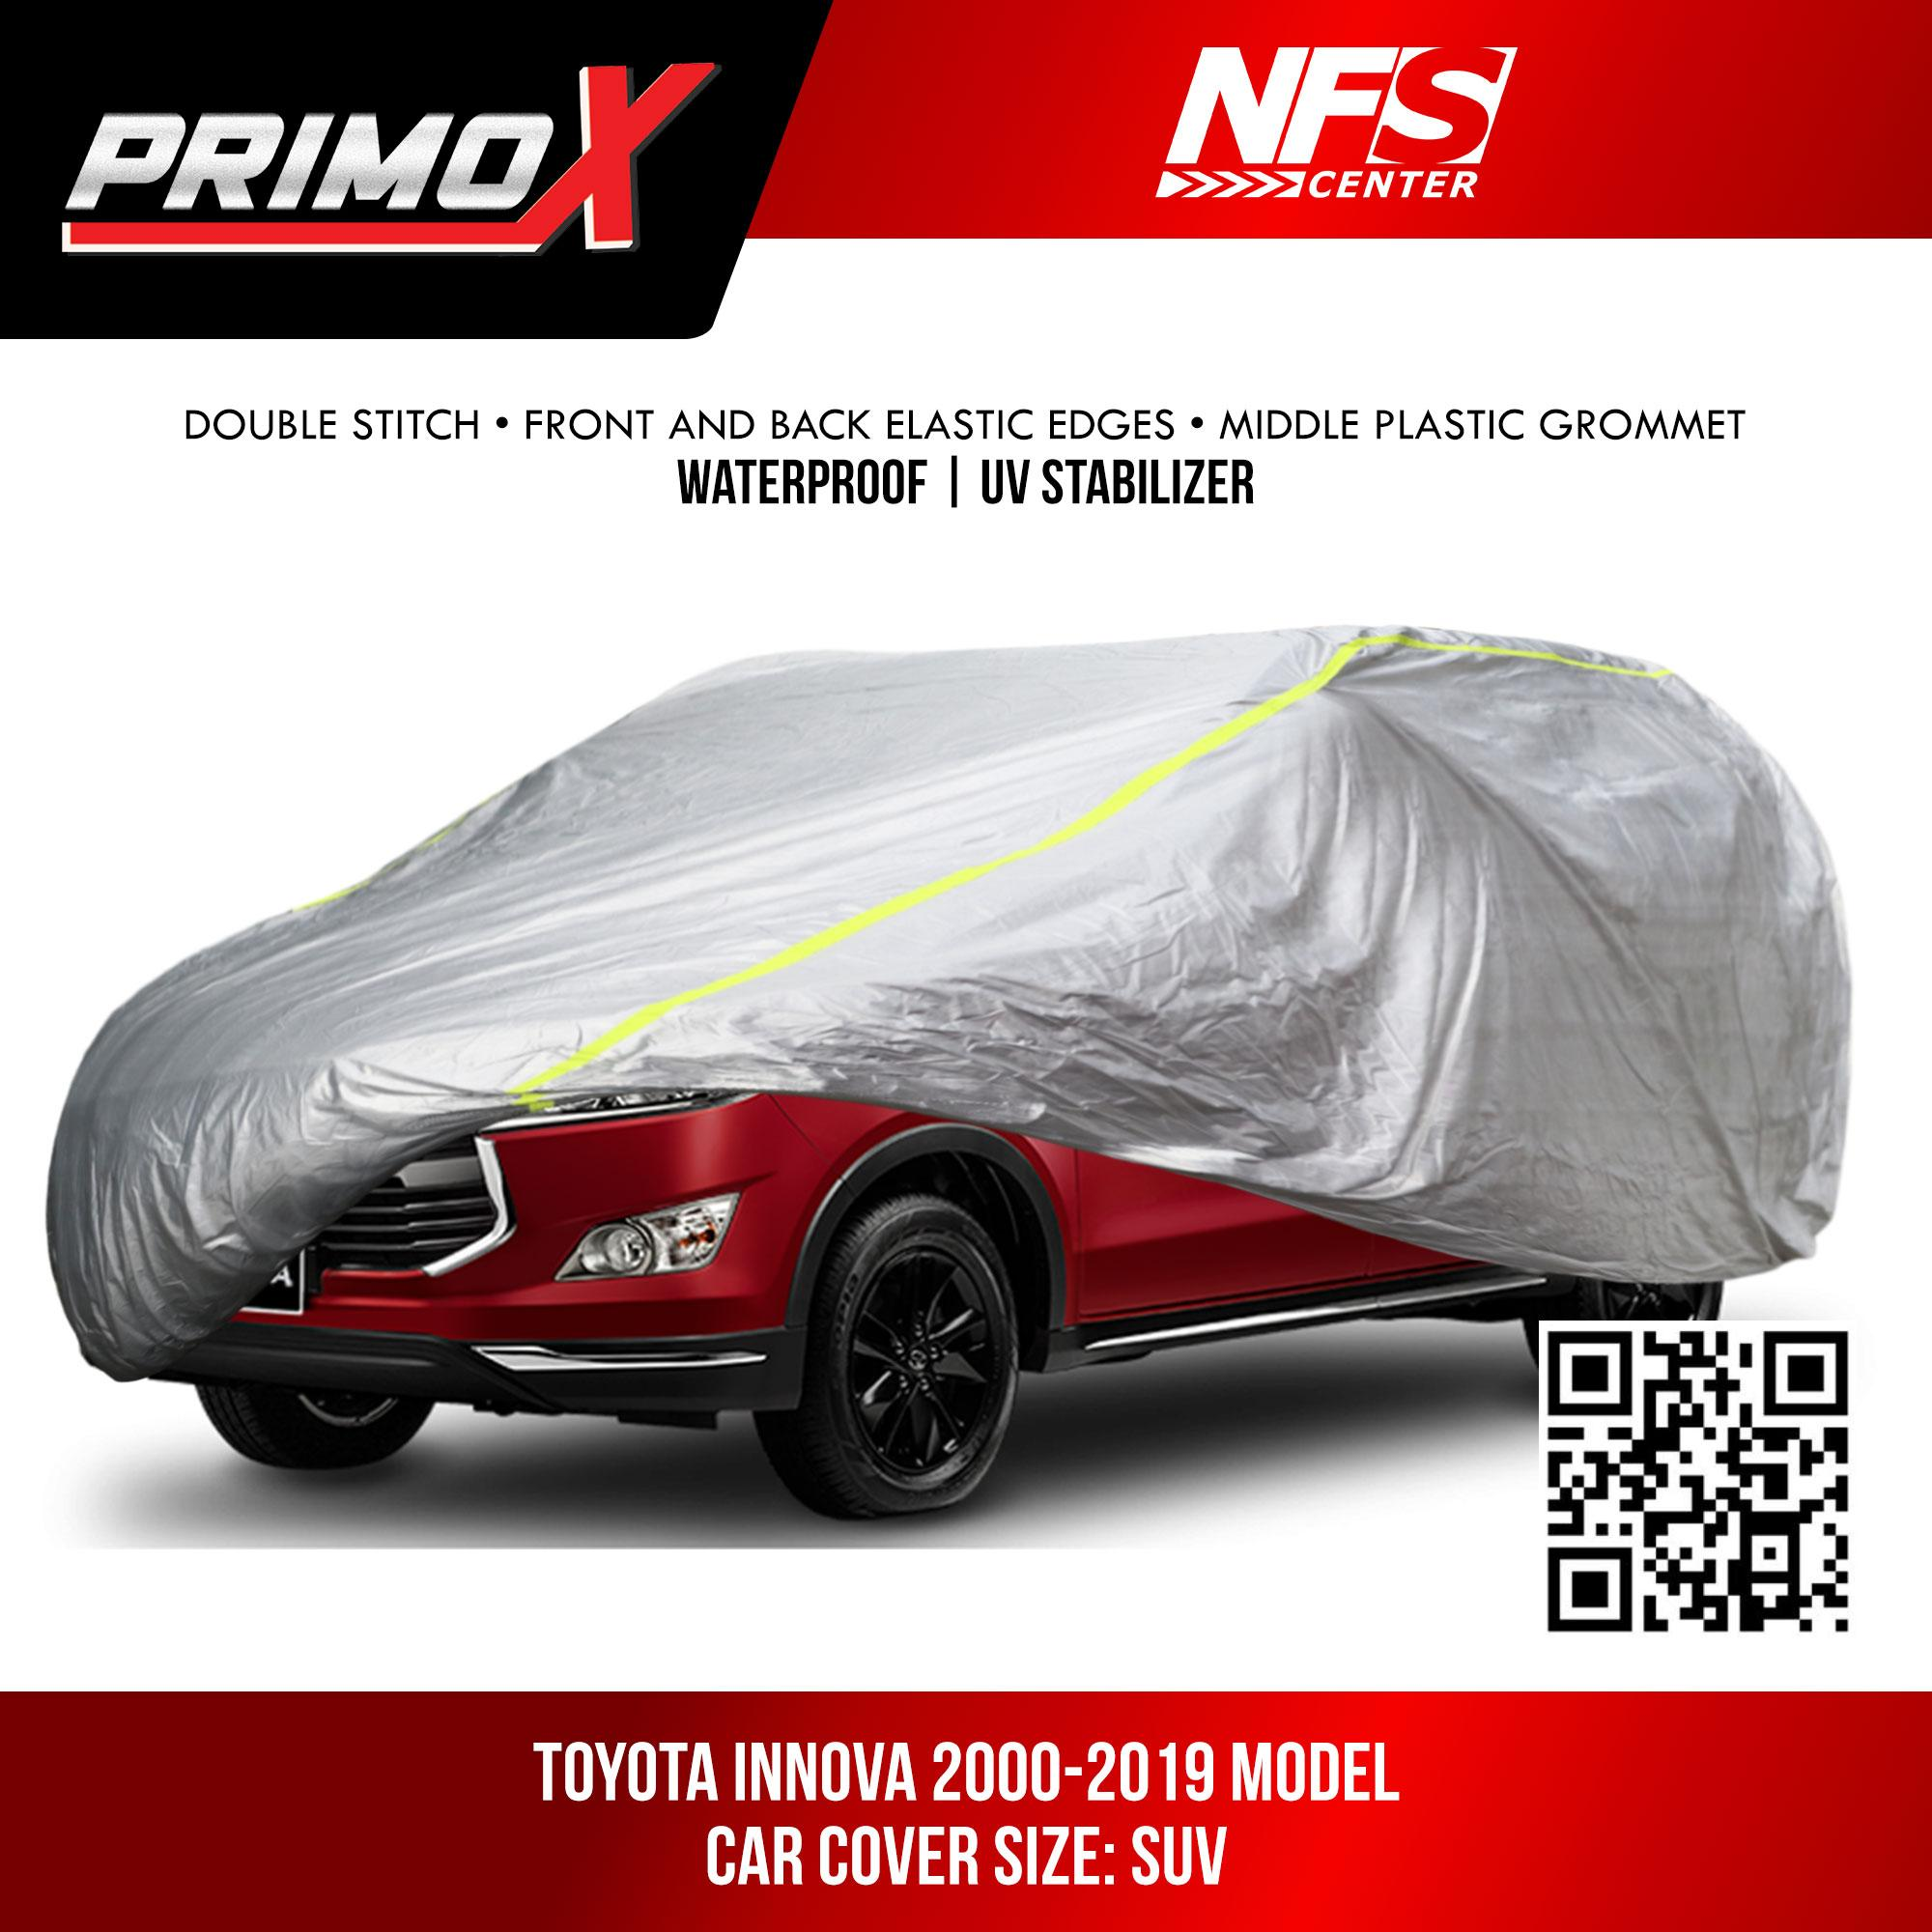 NFSC - Waterproof Aluminum Car Cover for Toyota Innova